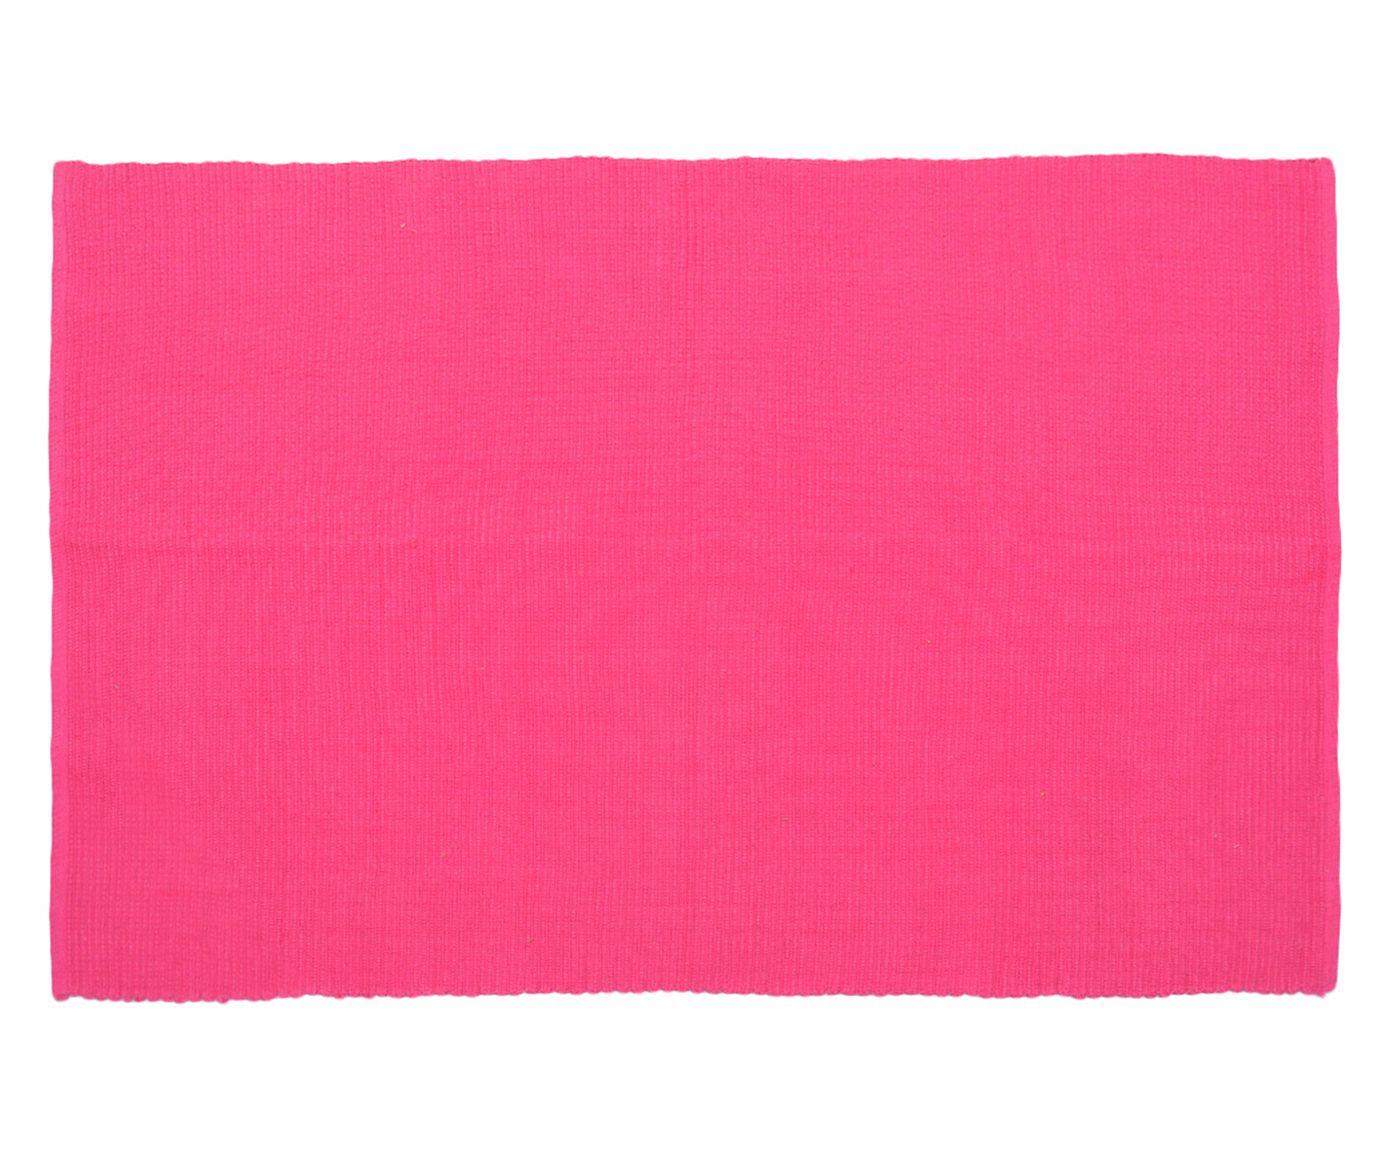 Tapete Indiano Mahavidya Rosa - 120x180cm | Westwing.com.br